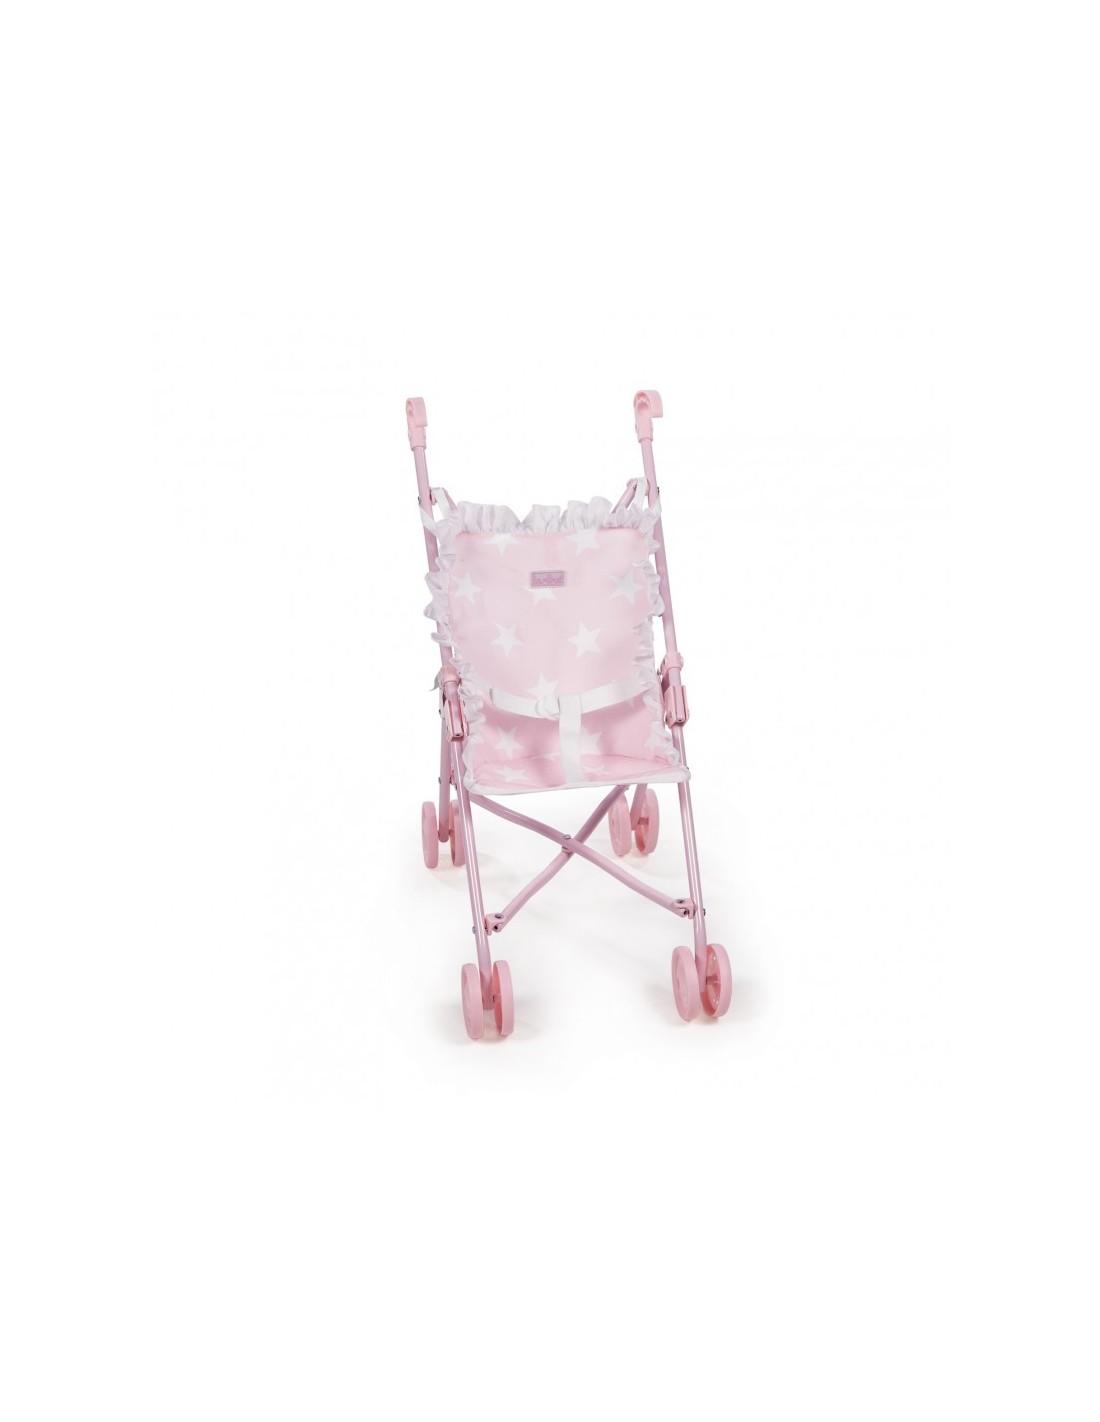 silla-pequena-carlota-27x53x41-cm-.jpg